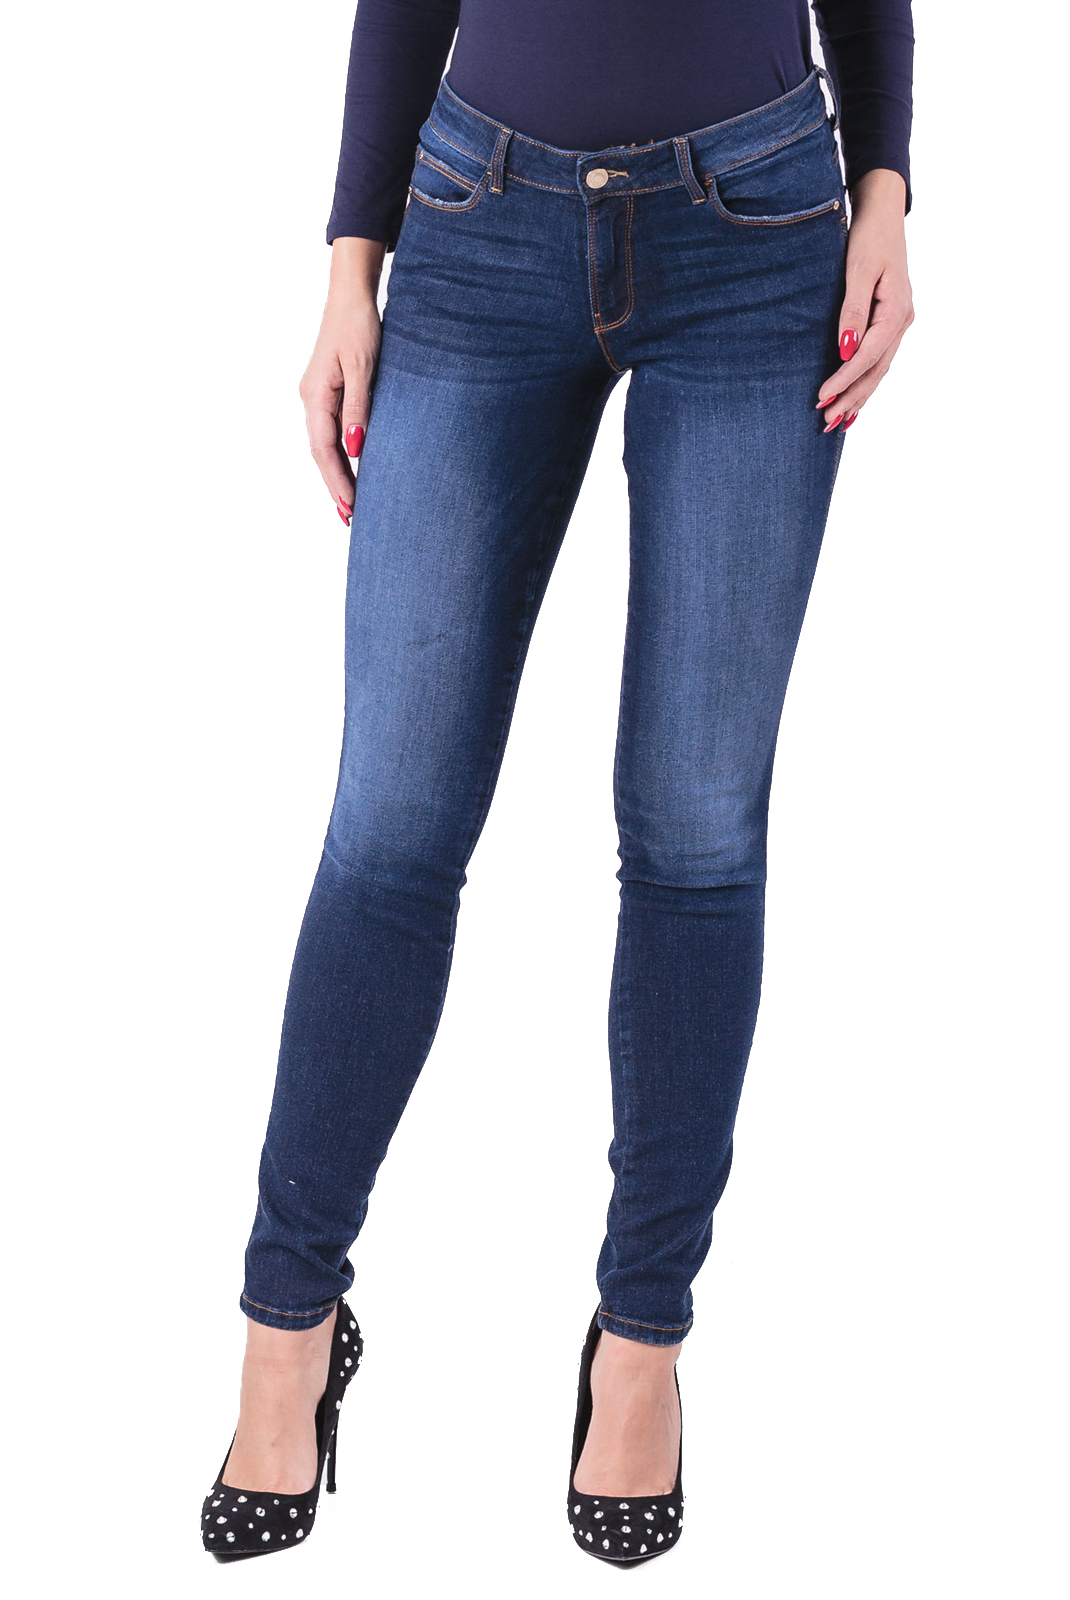 FEMME  Guess jeans W84AJ2 D3BJ0 INDIGO BERRY